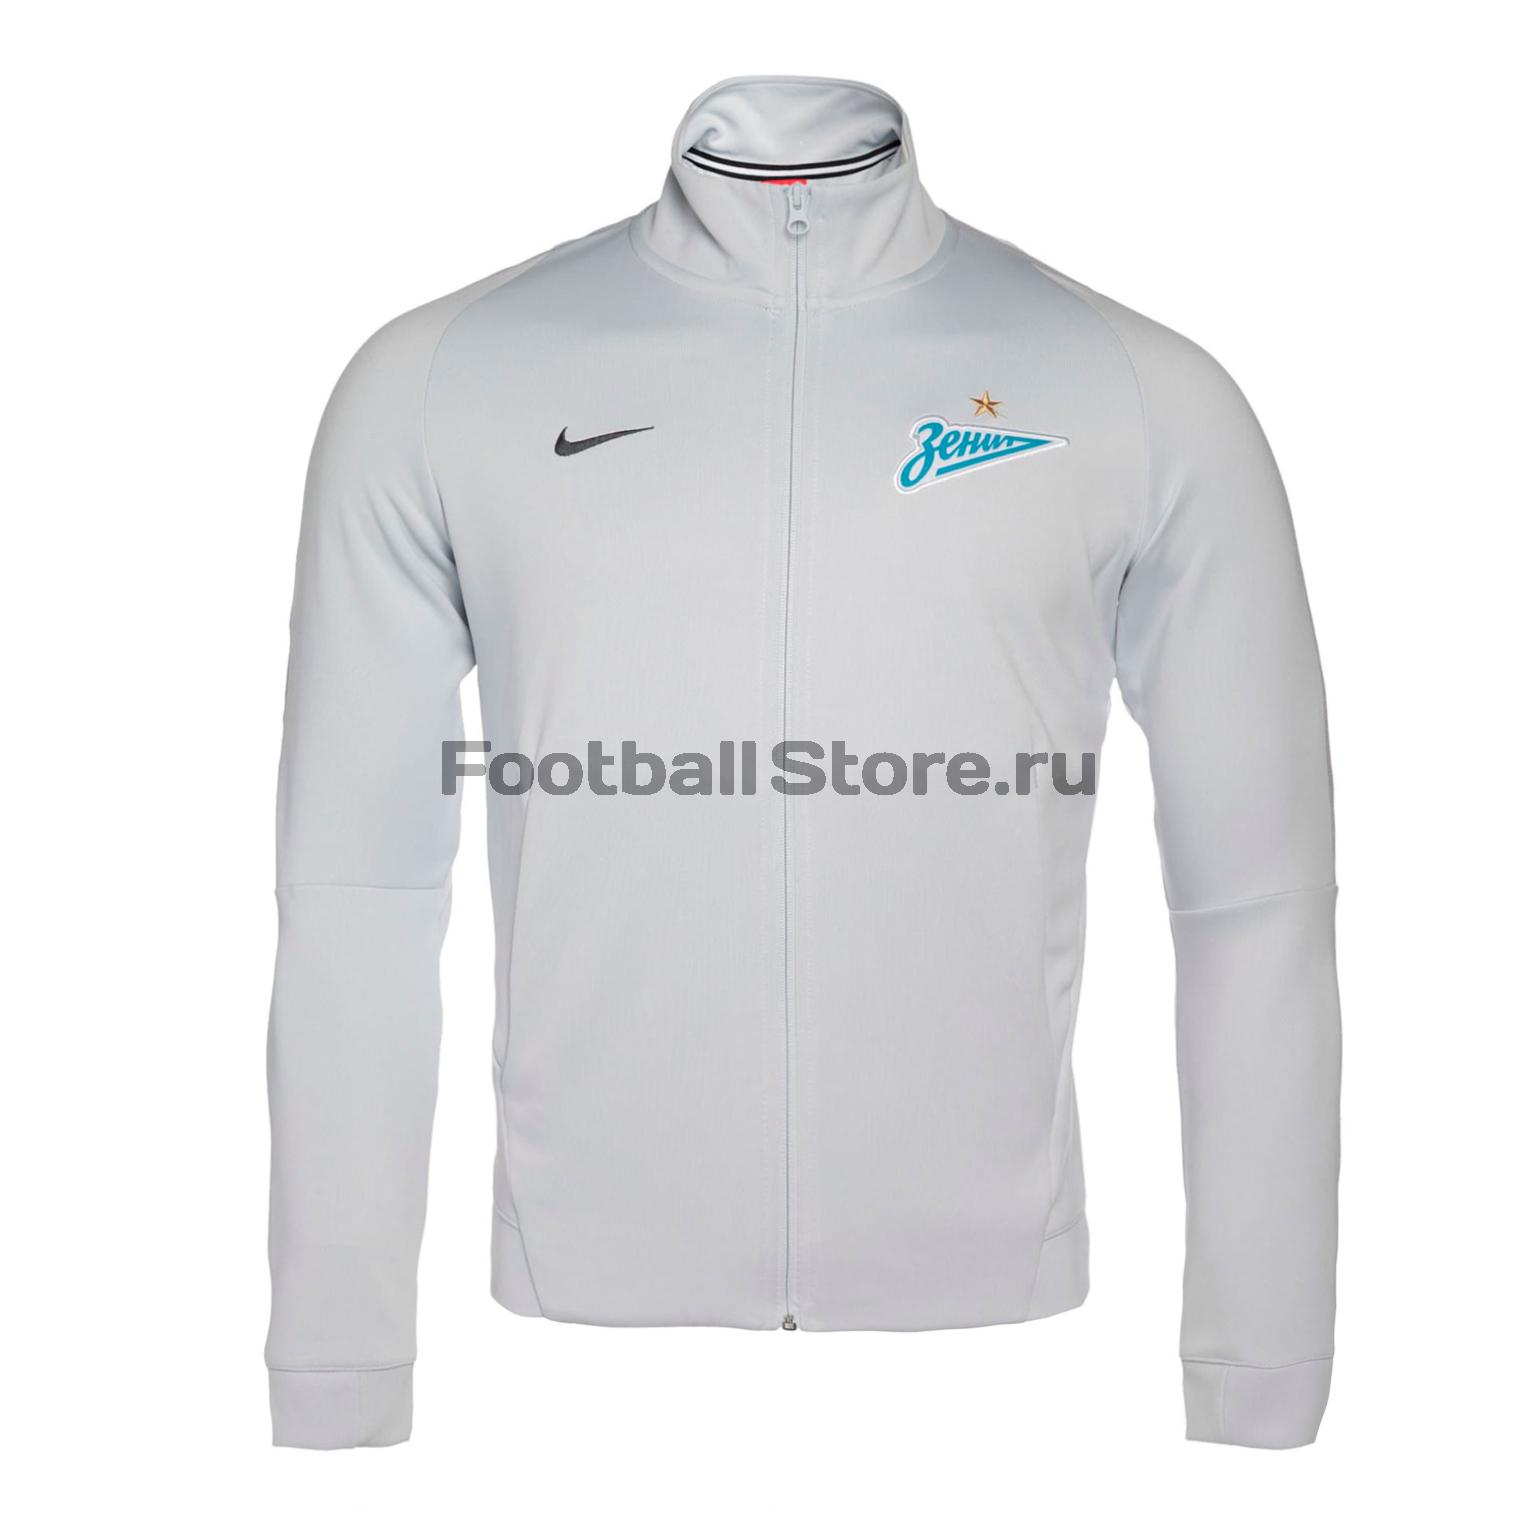 Олимпийка Nike Zenit 868908-043 шапки и кепки для туризма и кемпинга nike 666412 584169 410 010 688767 043 100 060